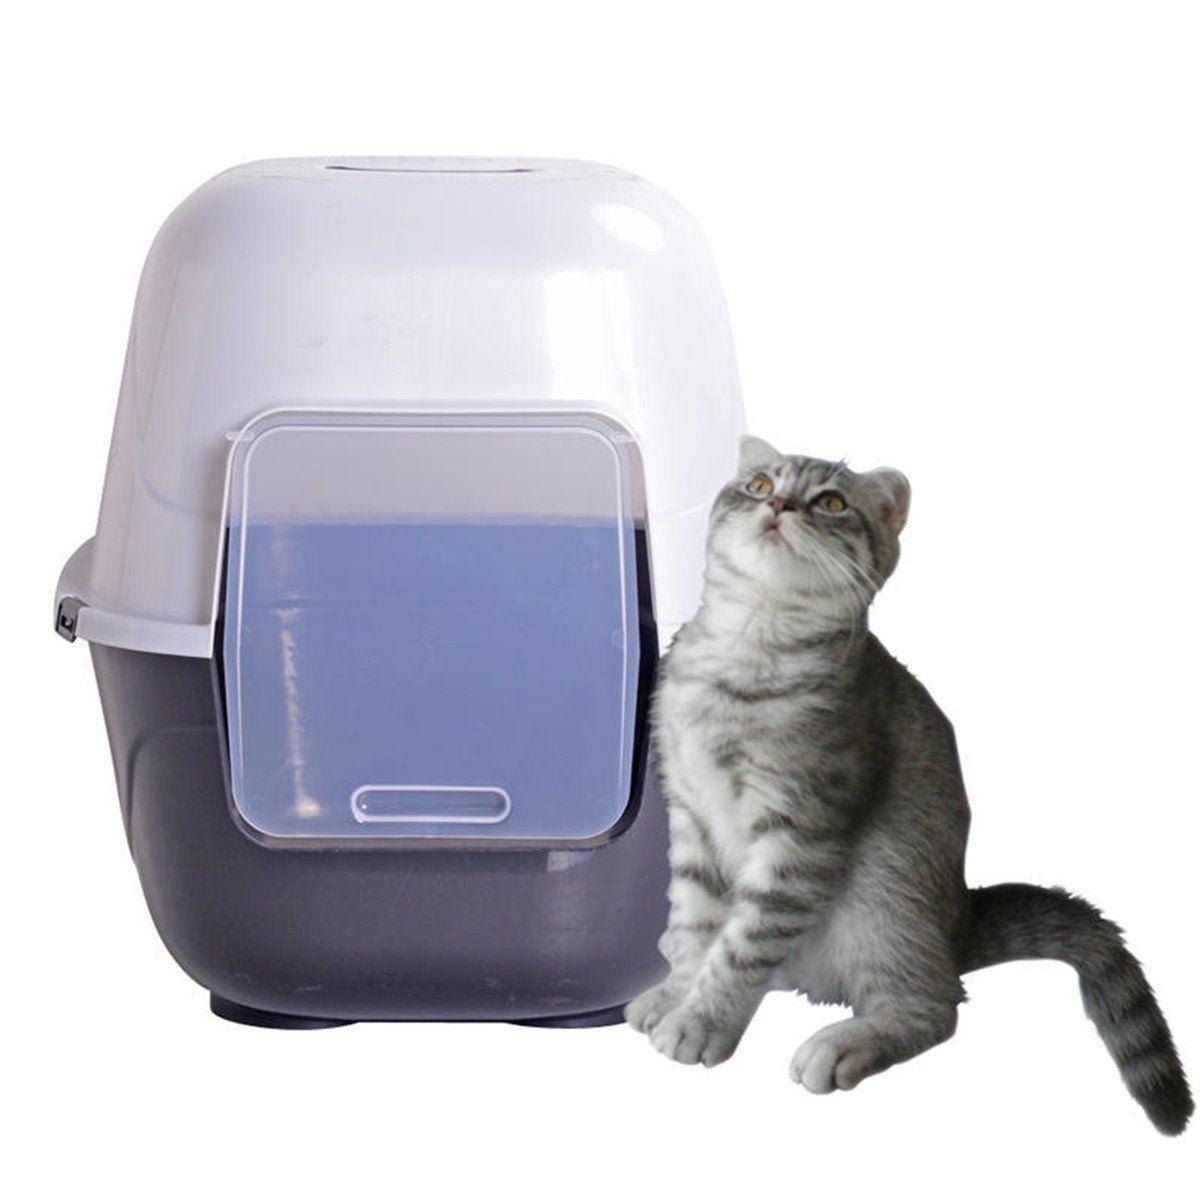 Favorite 24 Inch Cat Litter Box Extra Large Grey Jumbo Covered Litter Pan Enclosed Kitten Litter Box Giant Hooded Kitt Cat Litter Litter Box Cat Litter Box